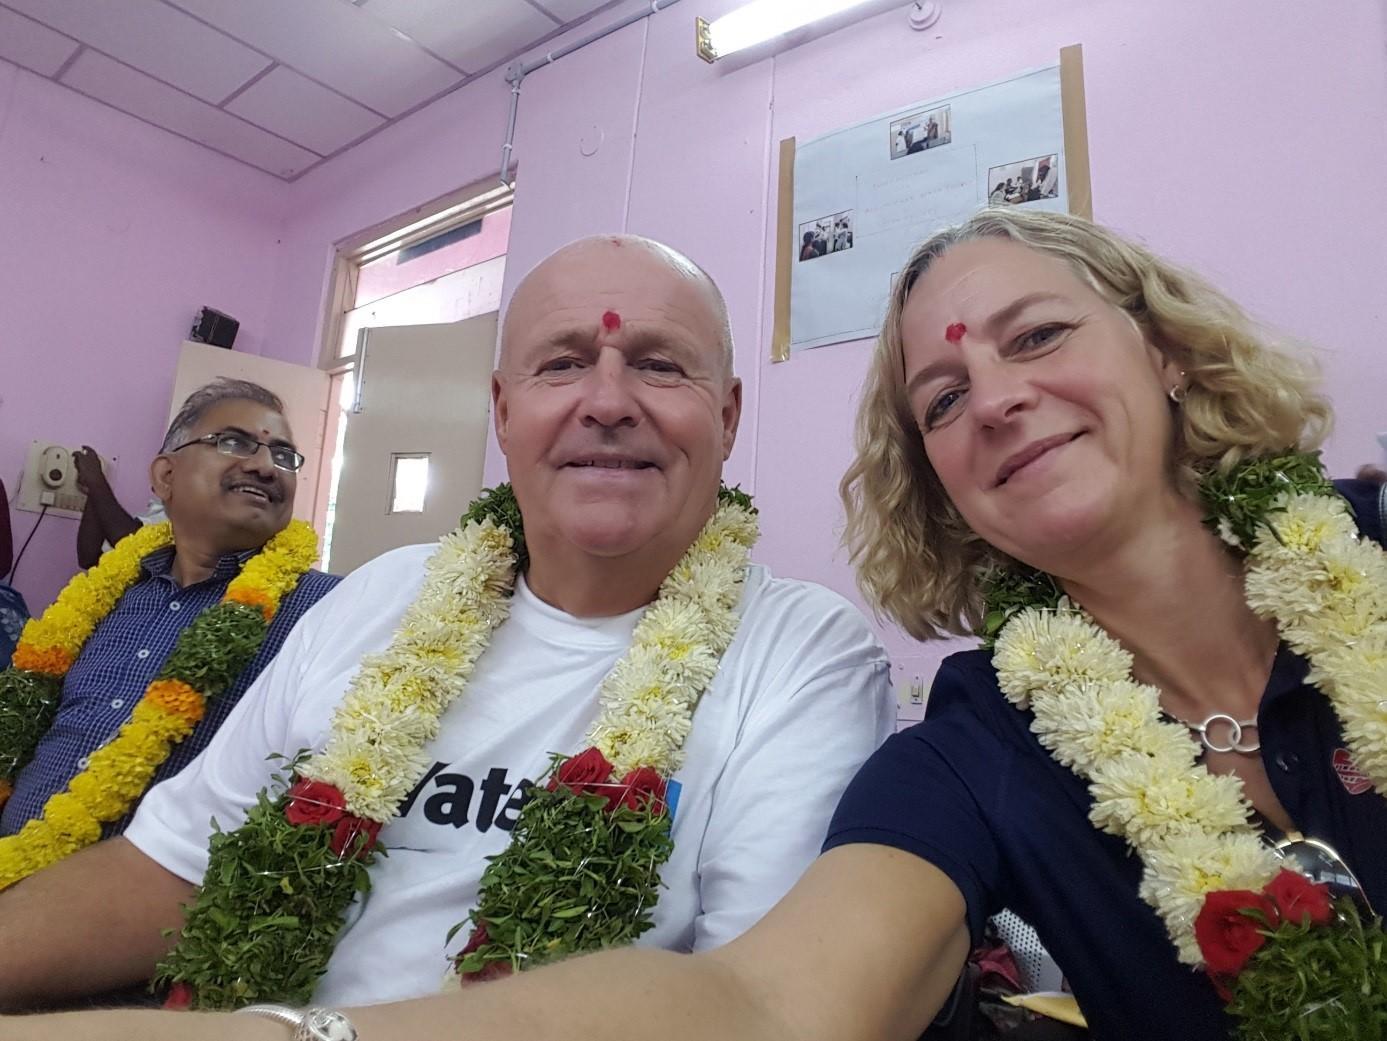 pollex wateraid indien britt-marie göran selfie.jpg